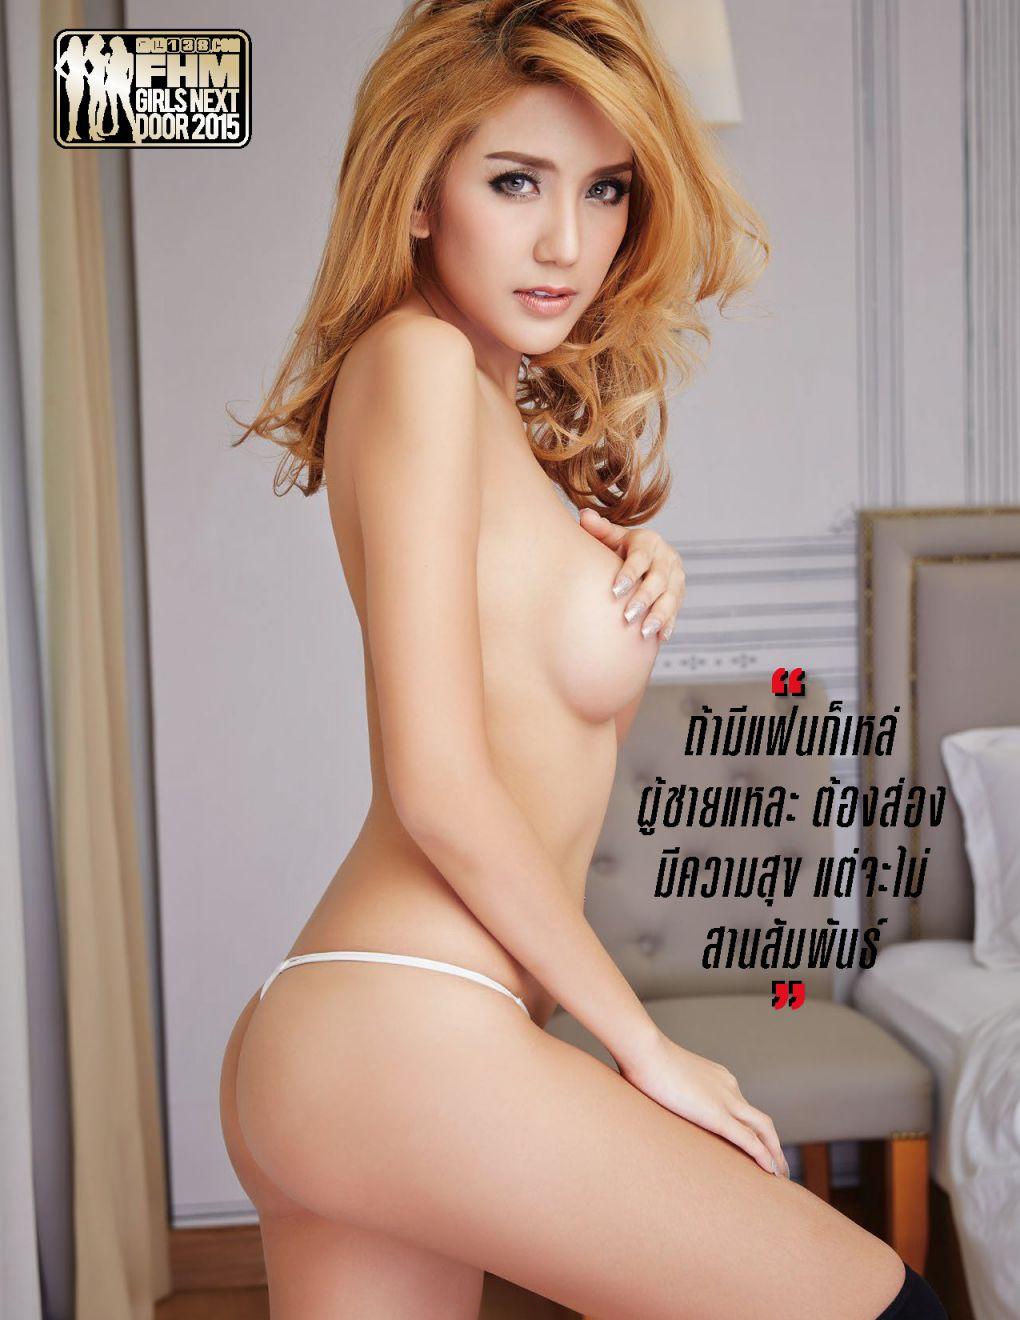 fhm sexiest women nue